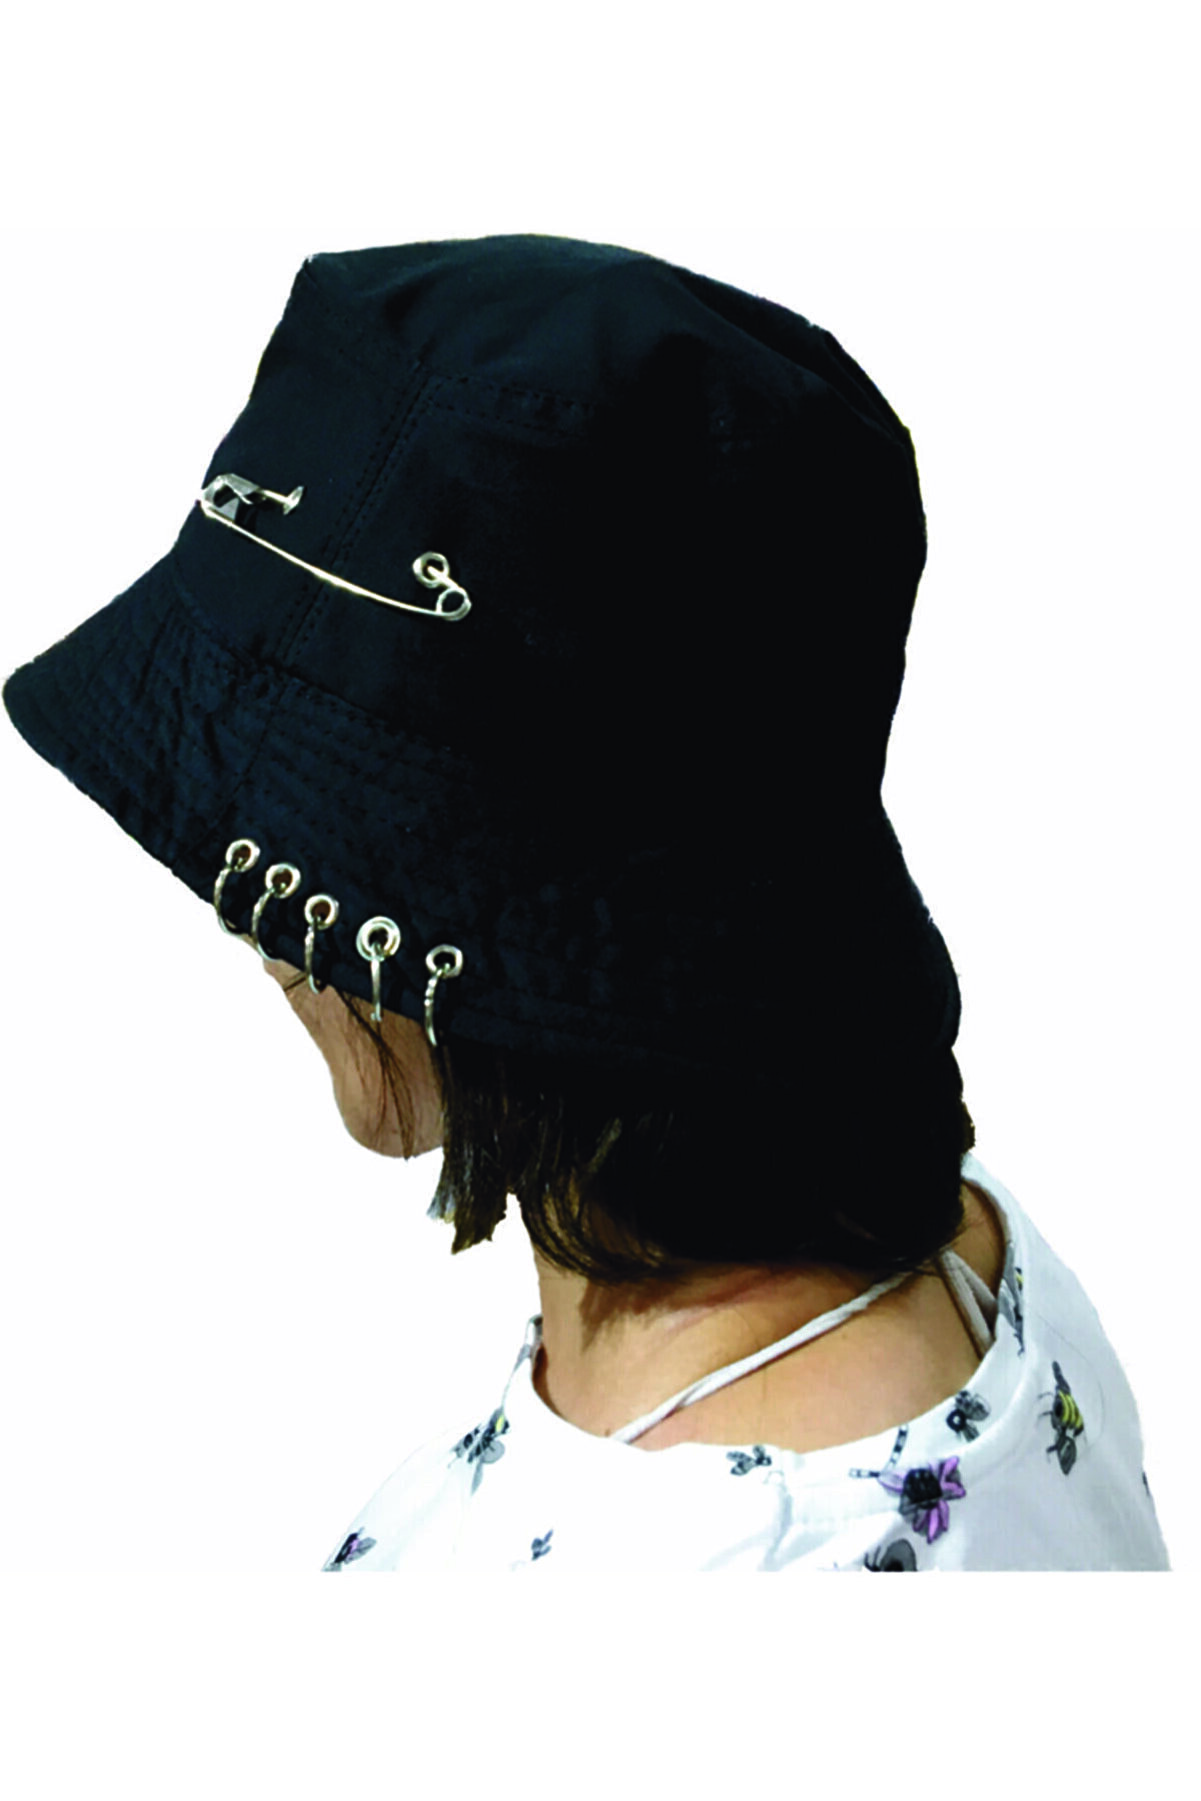 NO NAME Kpop Piercingli Iğneli Balıkçı Şapka